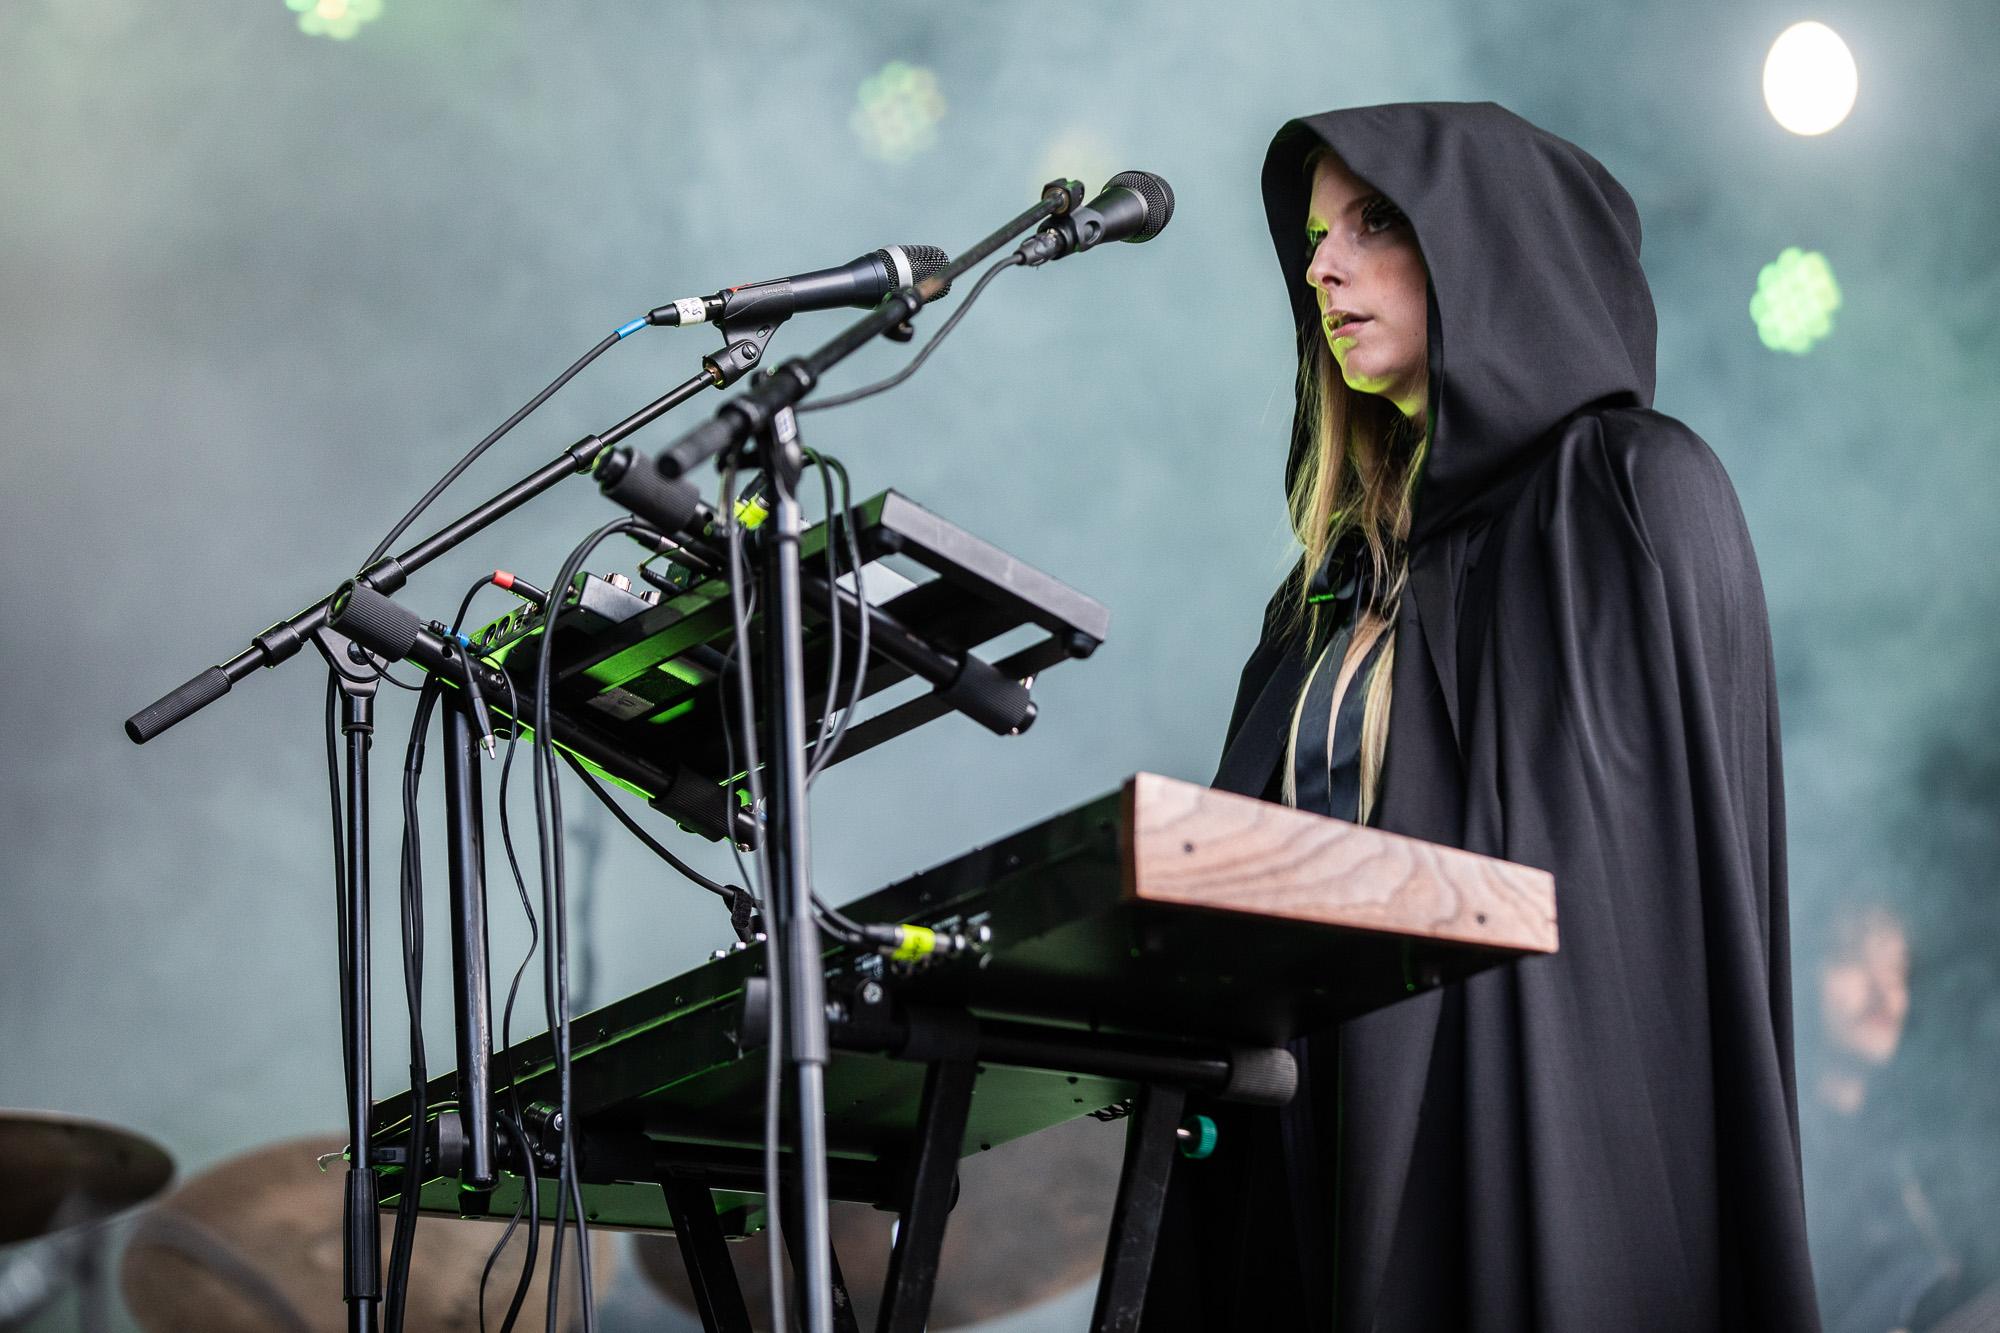 Susanne Sundfør @ Piknik i Parken 2018